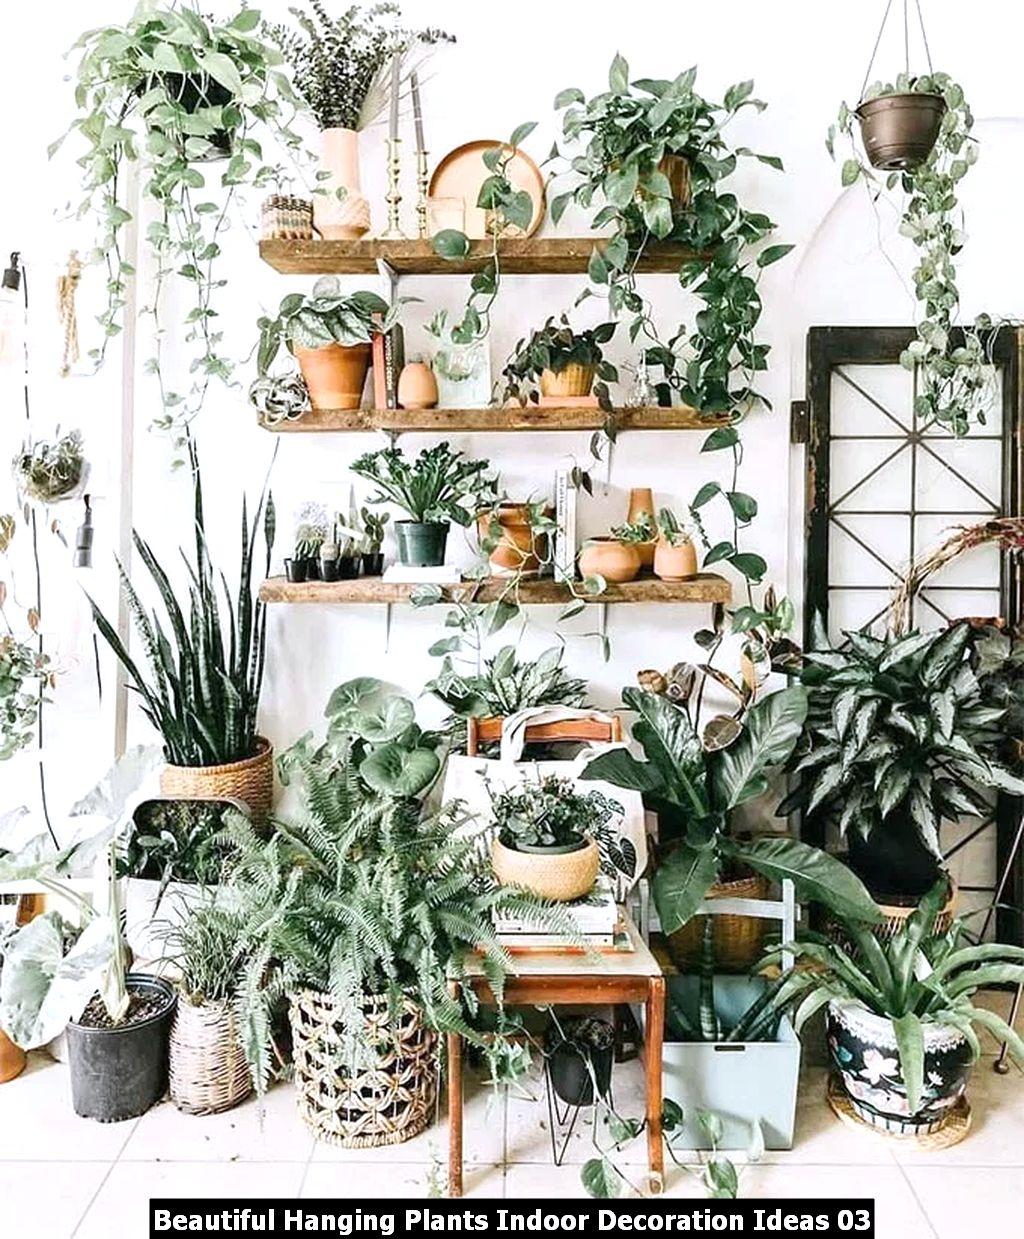 Beautiful Hanging Plants Indoor Decoration Ideas 03